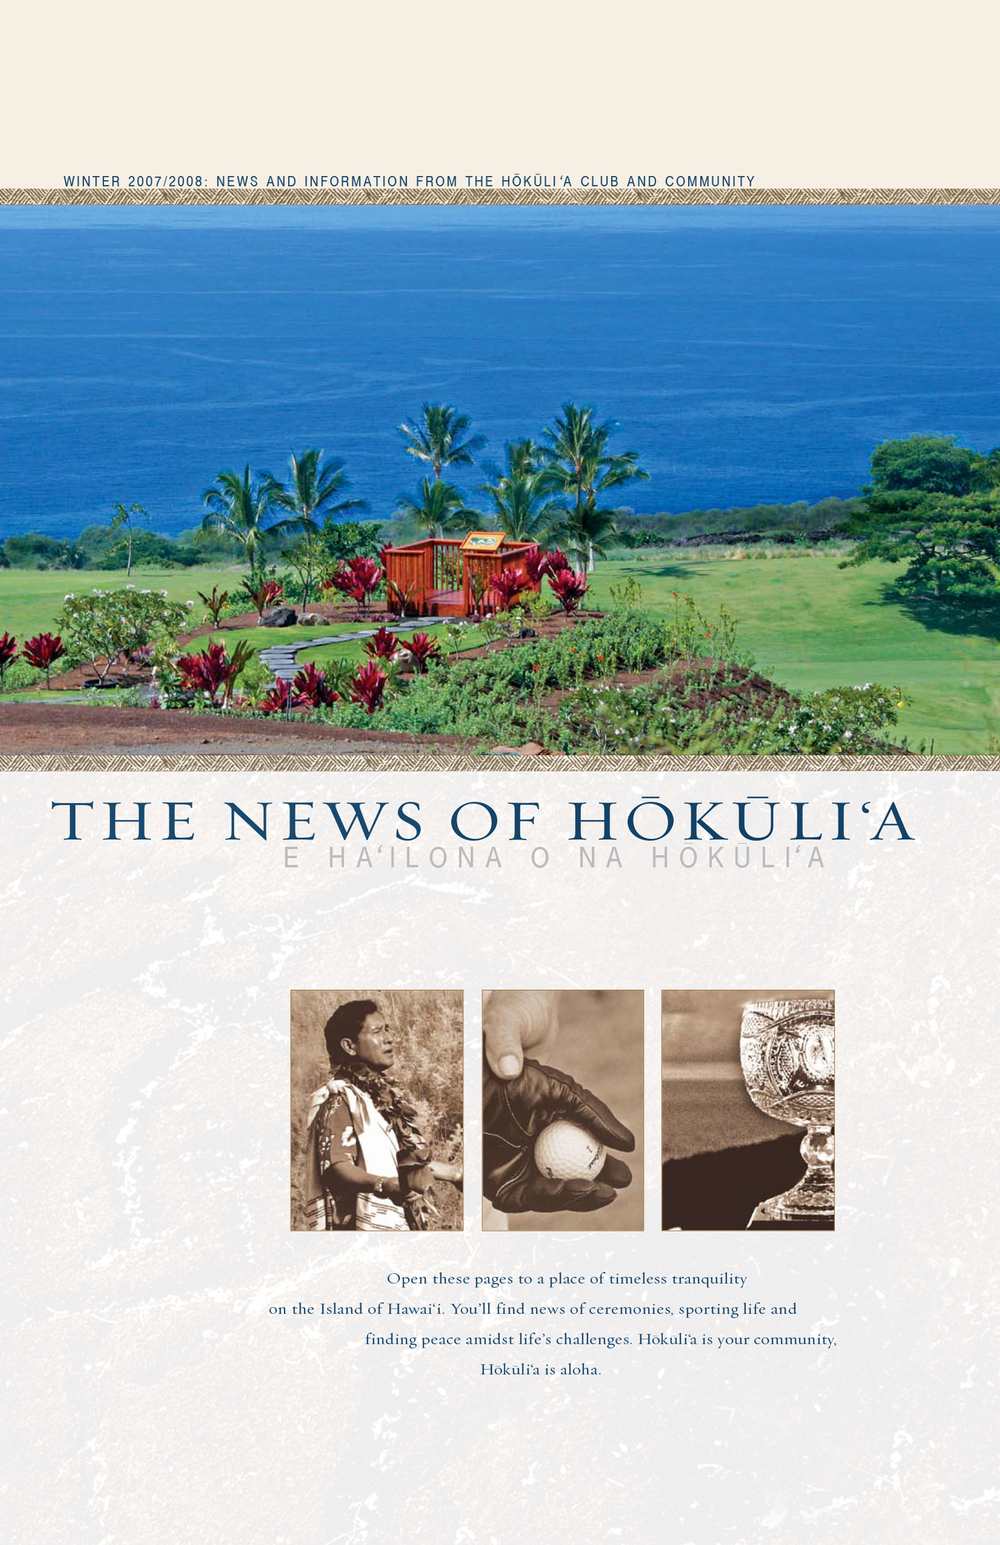 Hokulia-spread-A3.jpg